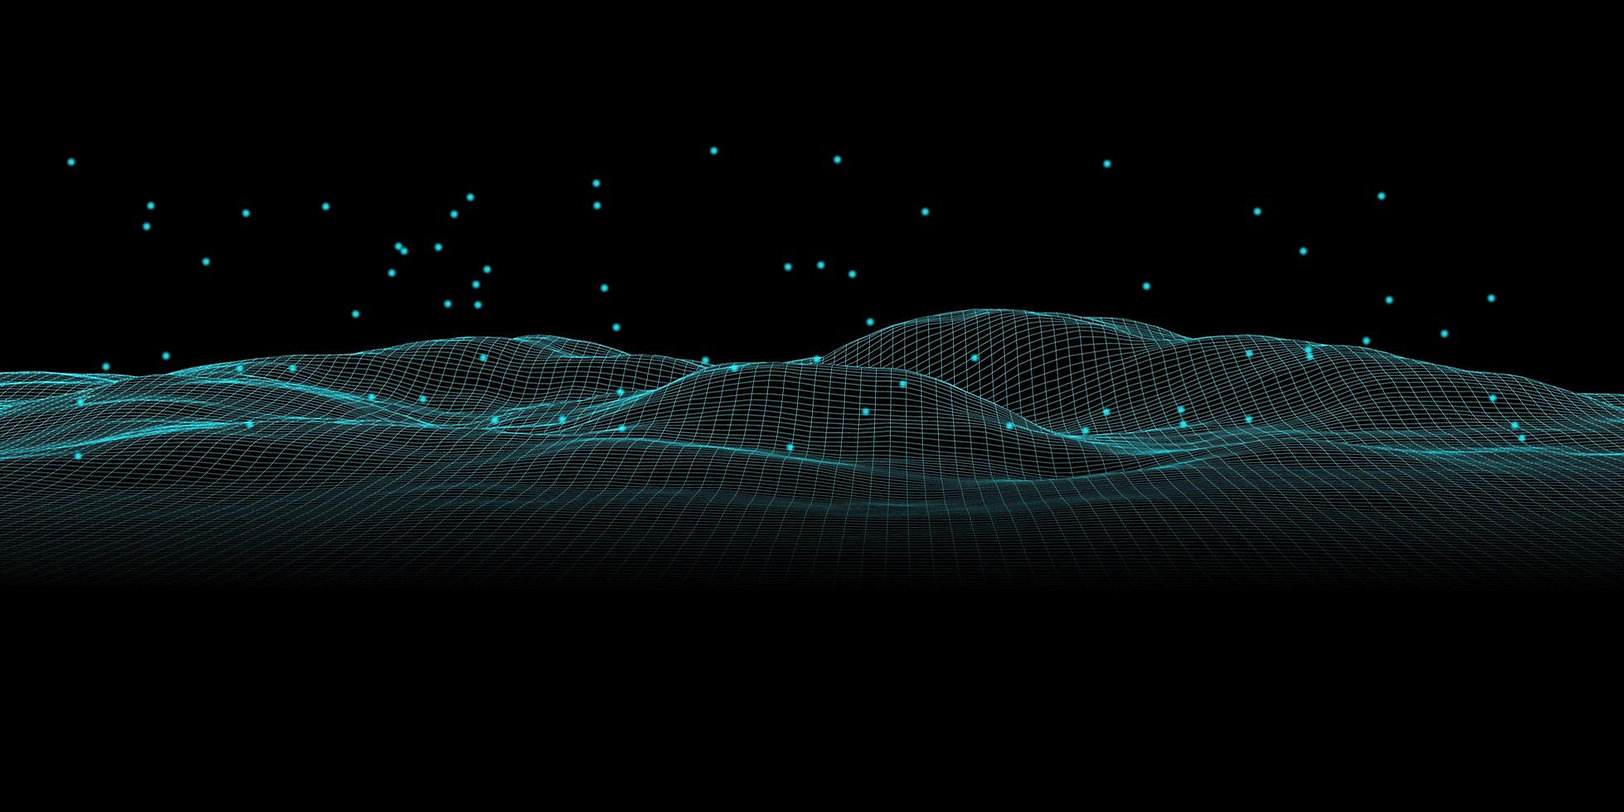 abstract-futuristic-modern-wireframe-lan